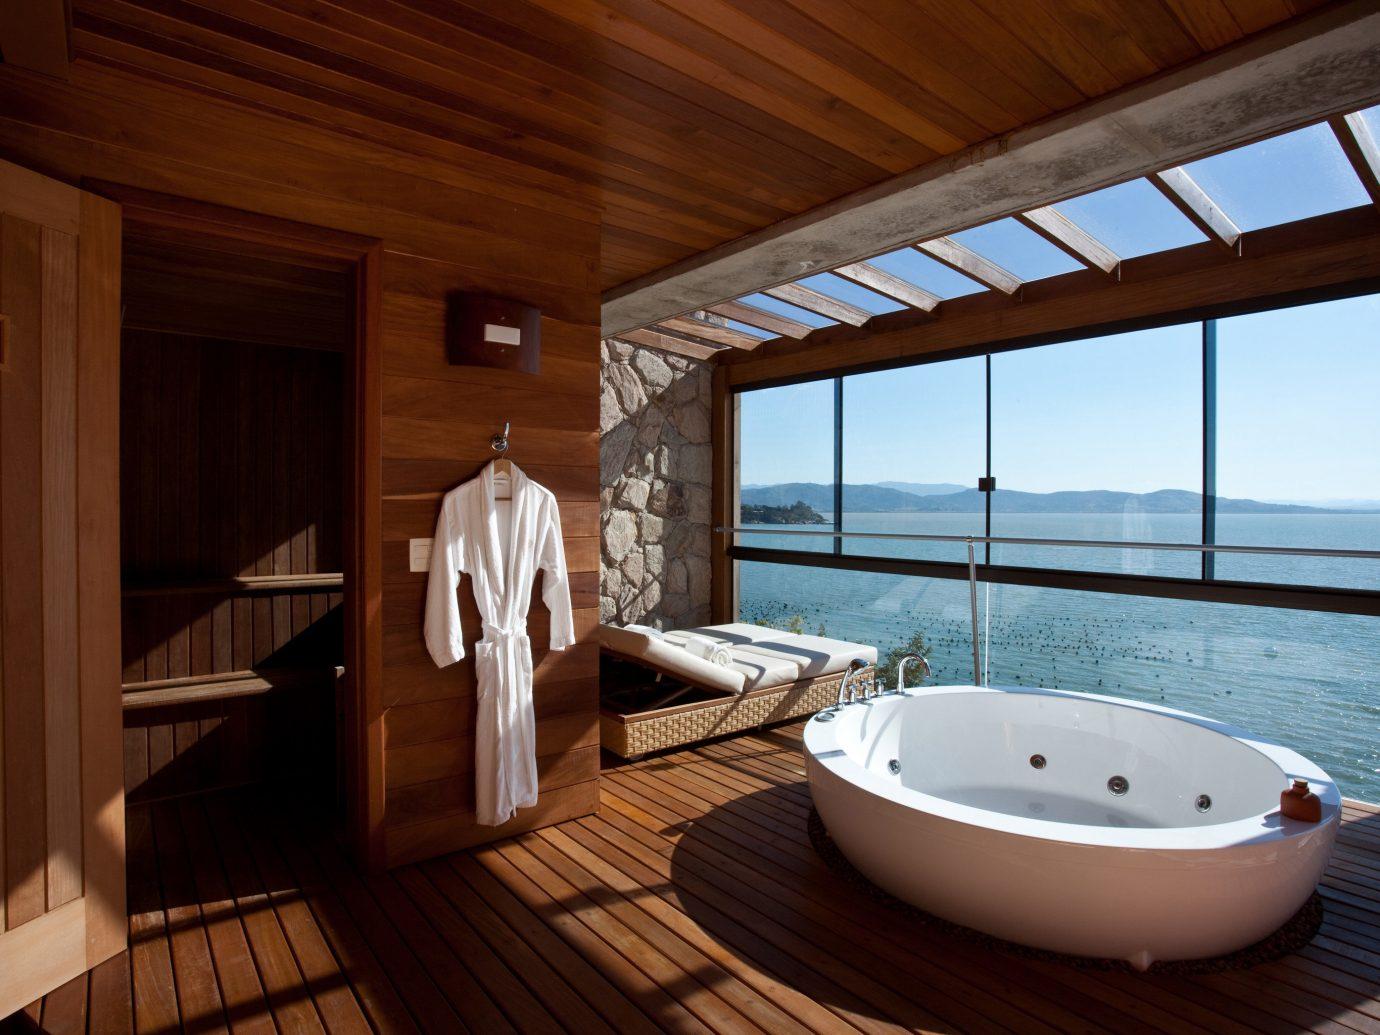 Hotels indoor ceiling floor window room swimming pool building counter sink estate jacuzzi cottage tub bathtub